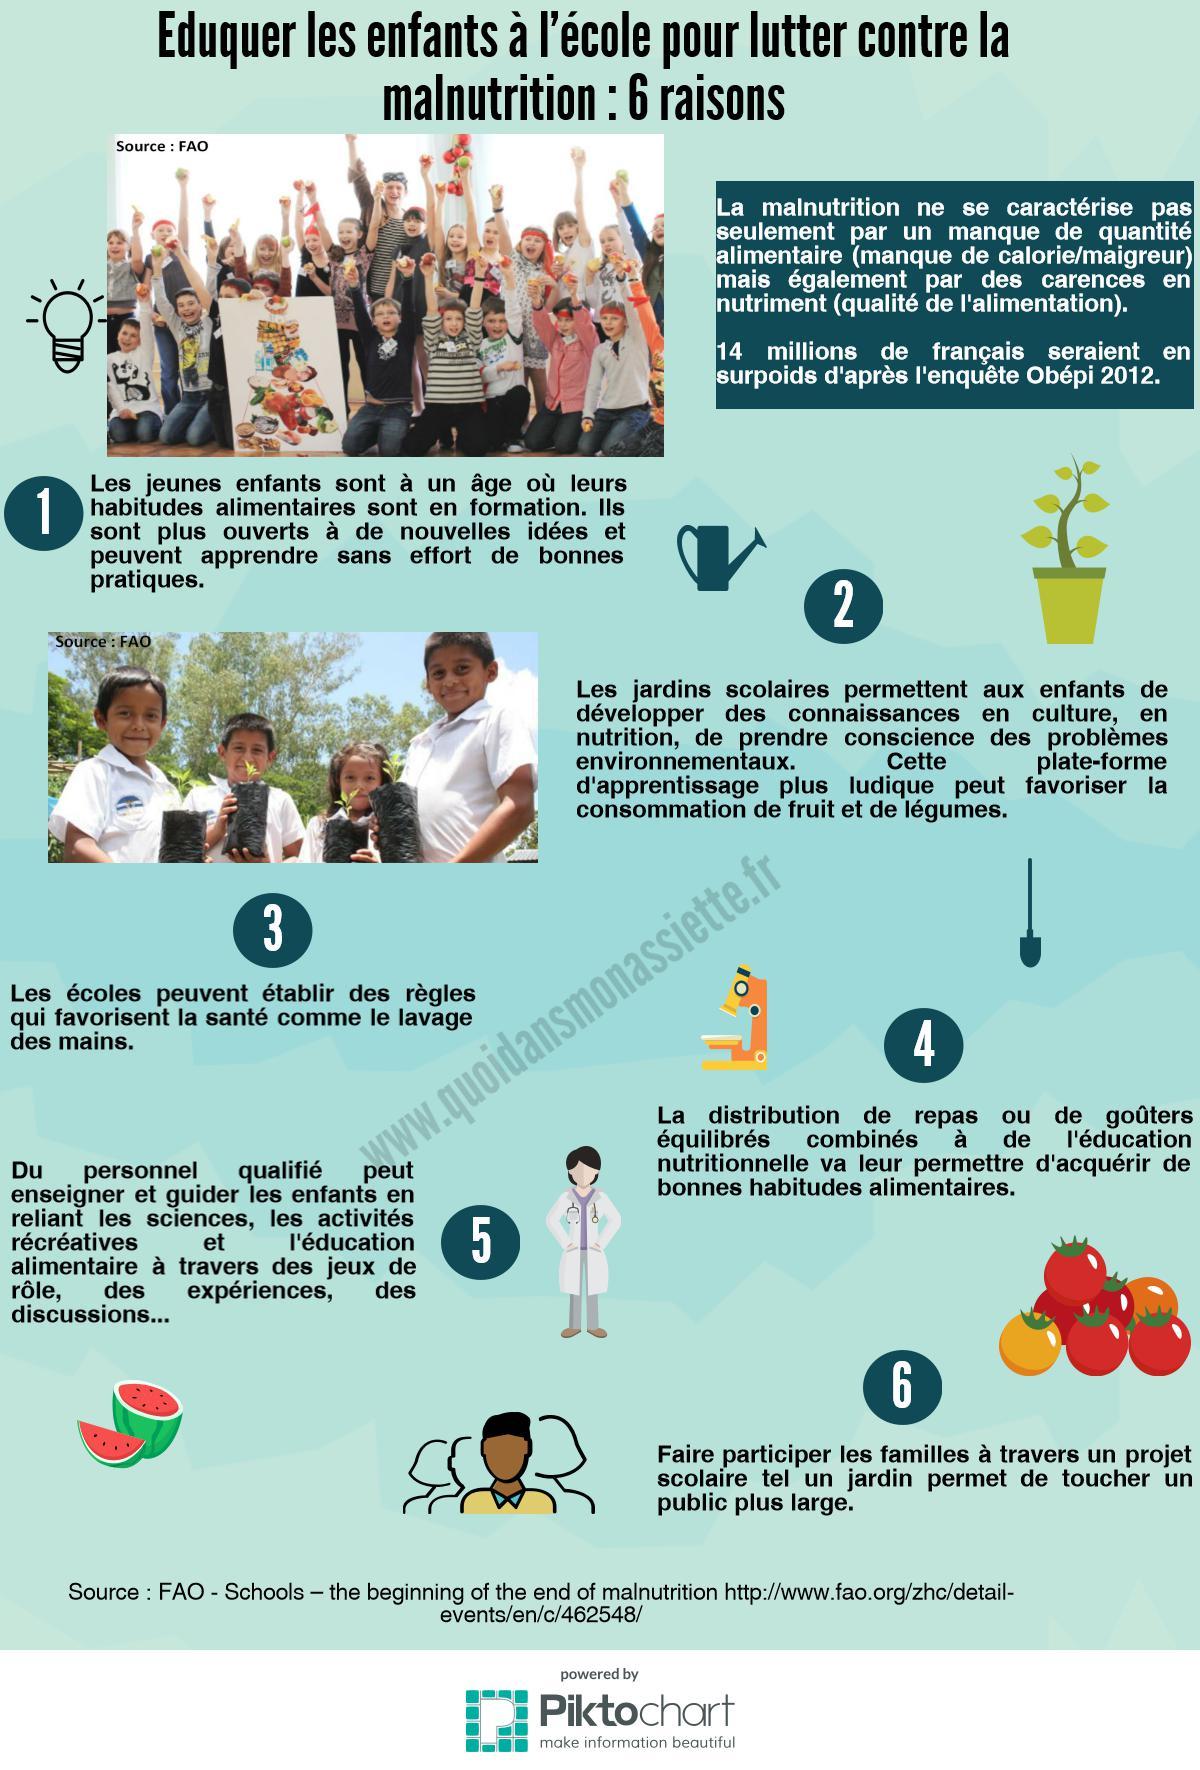 ecole education alimentation nutrition malnutrition jardin scolaire